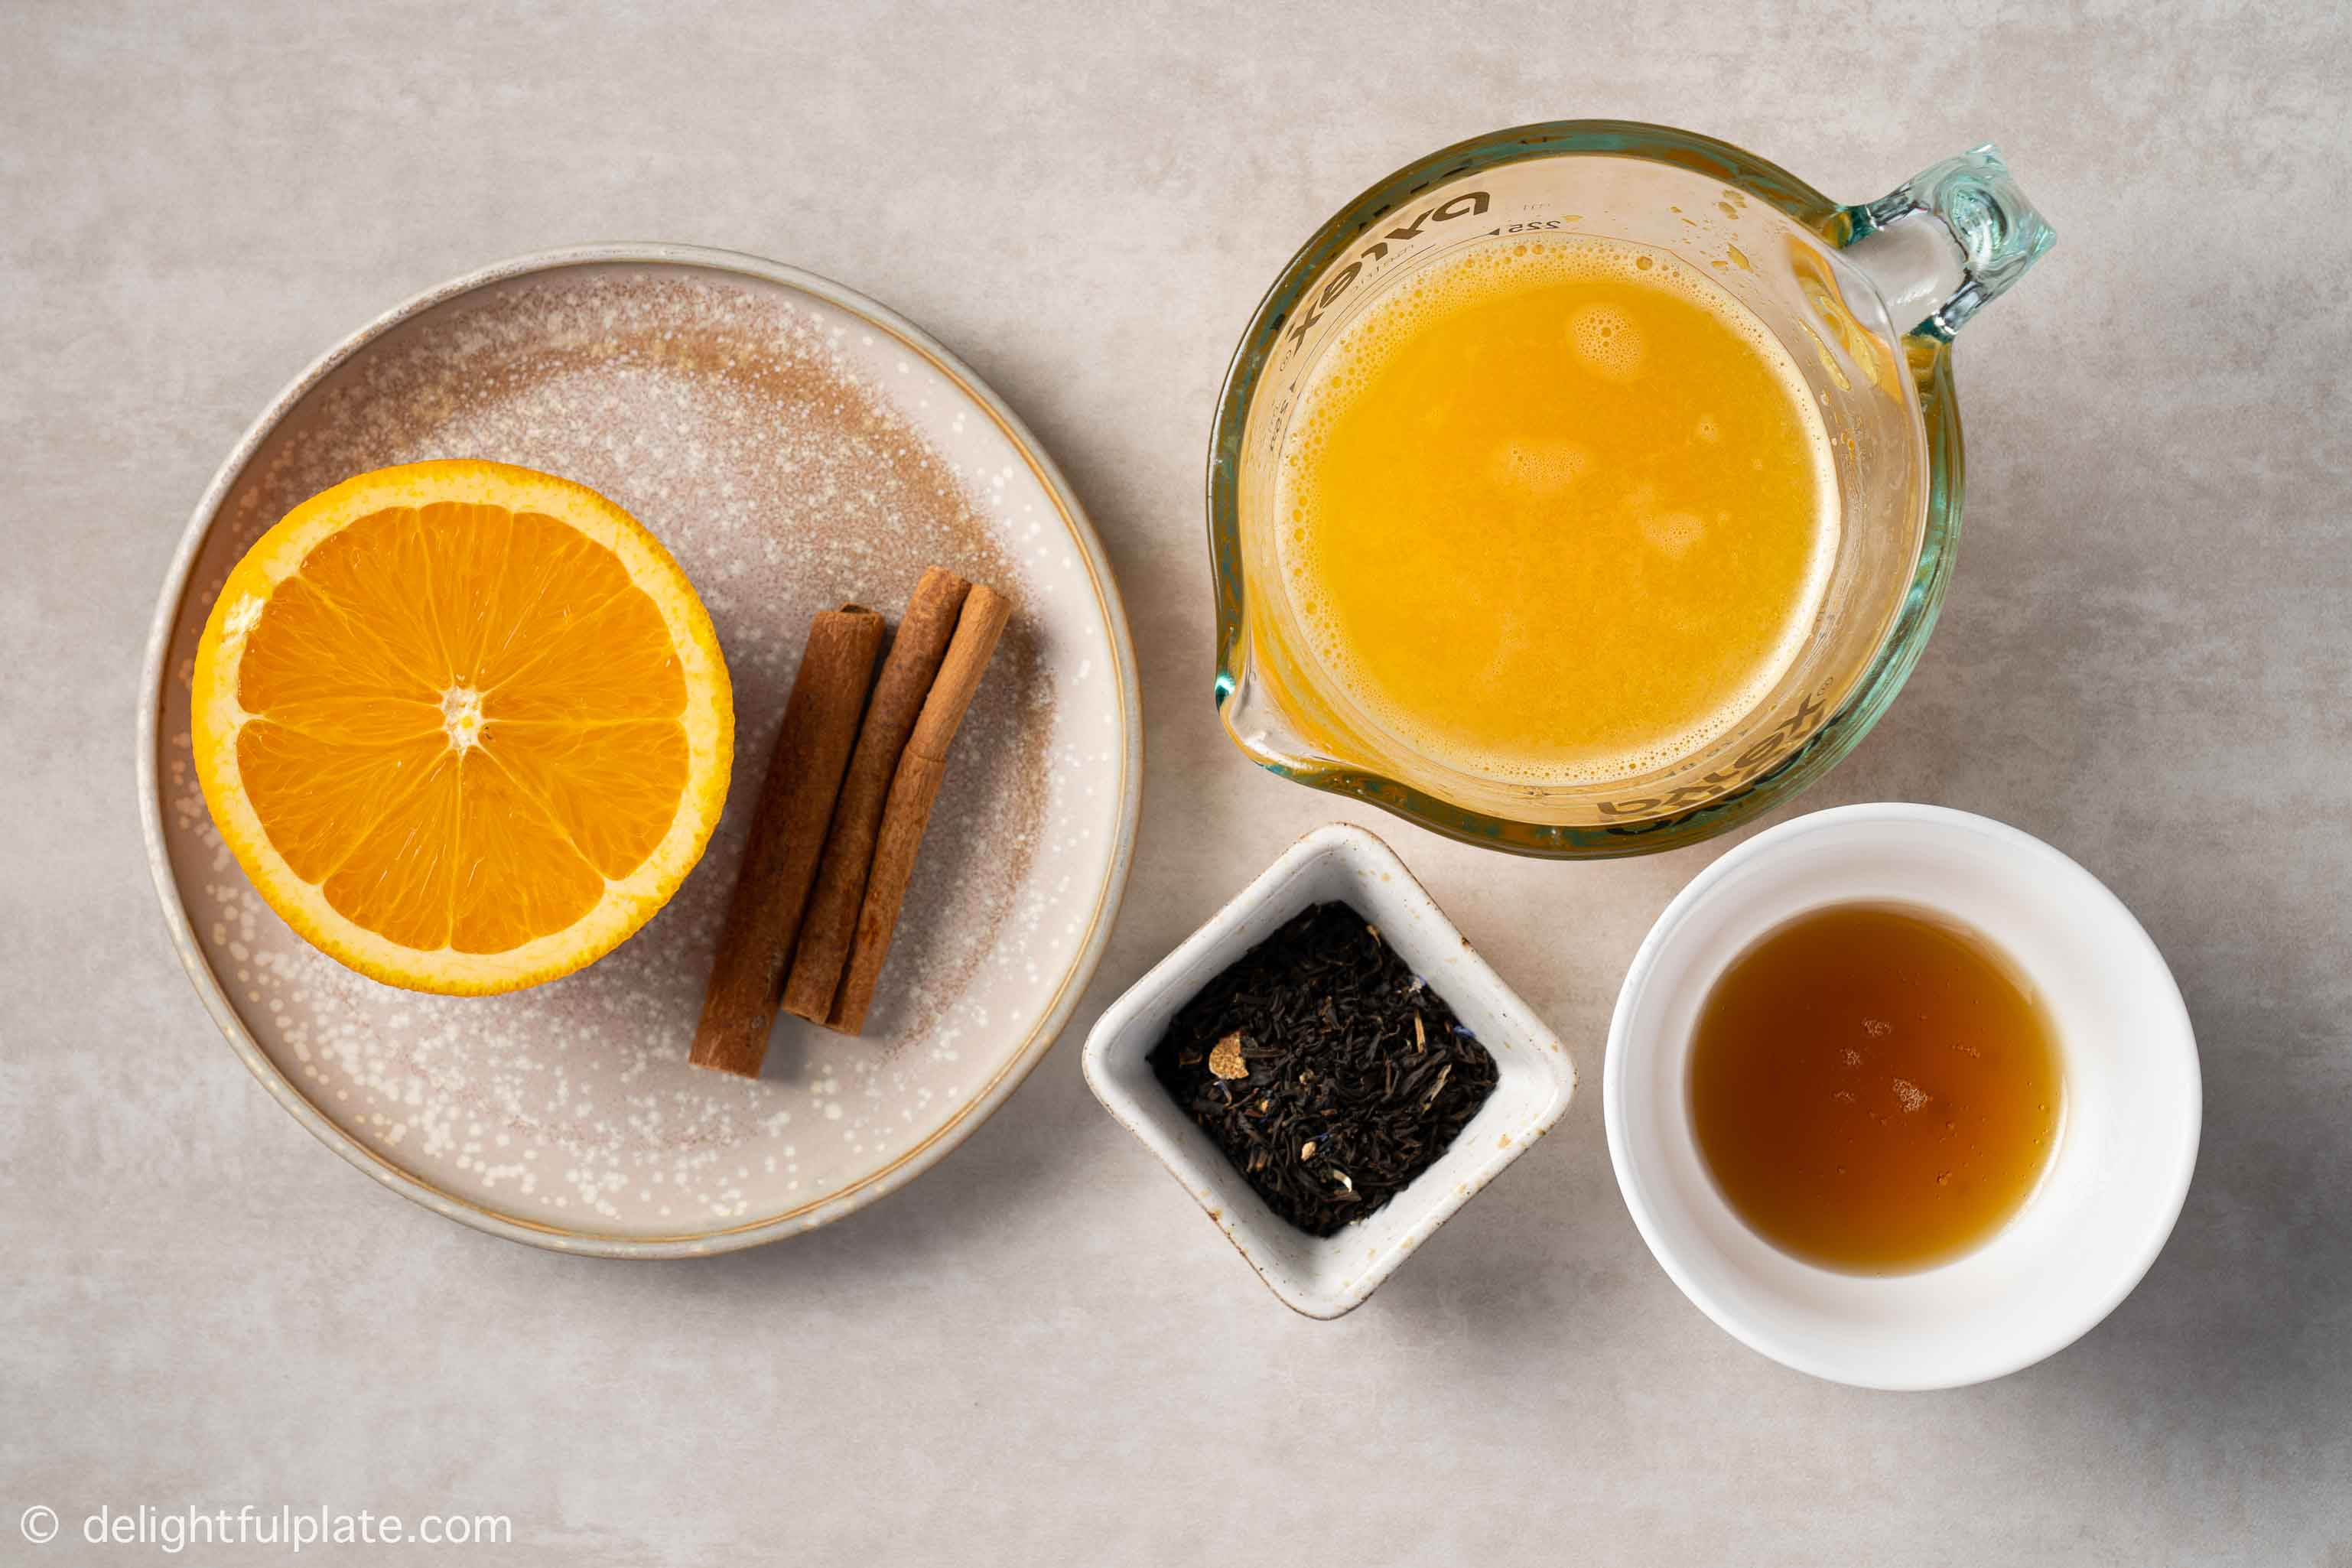 plates containing ingredients for orange cinnamon tea